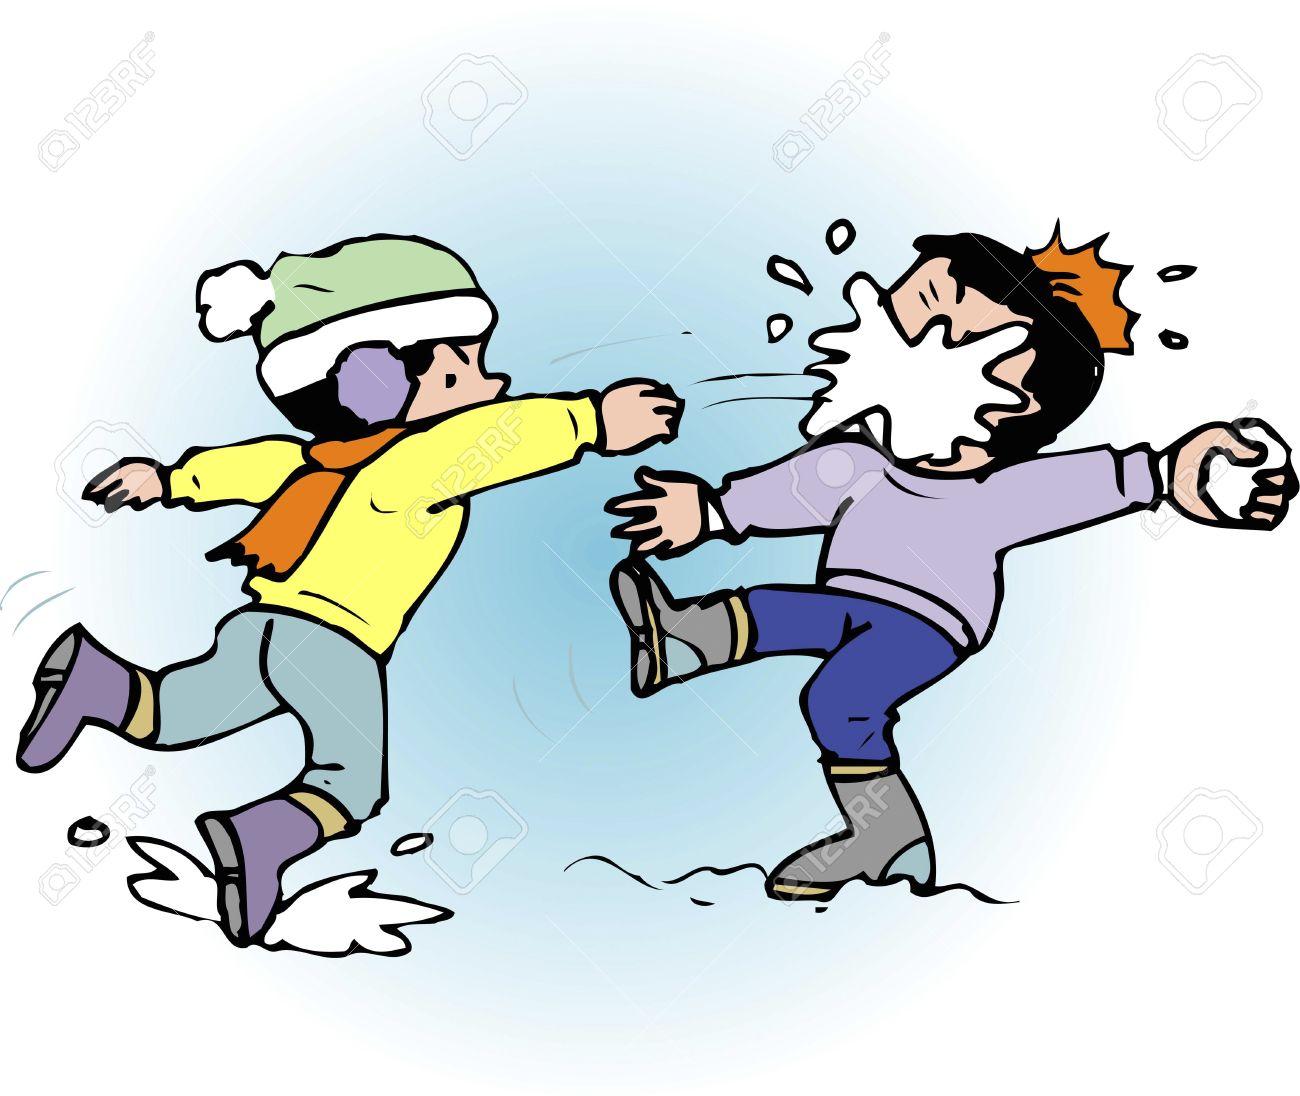 snowball fight: Snowball fight